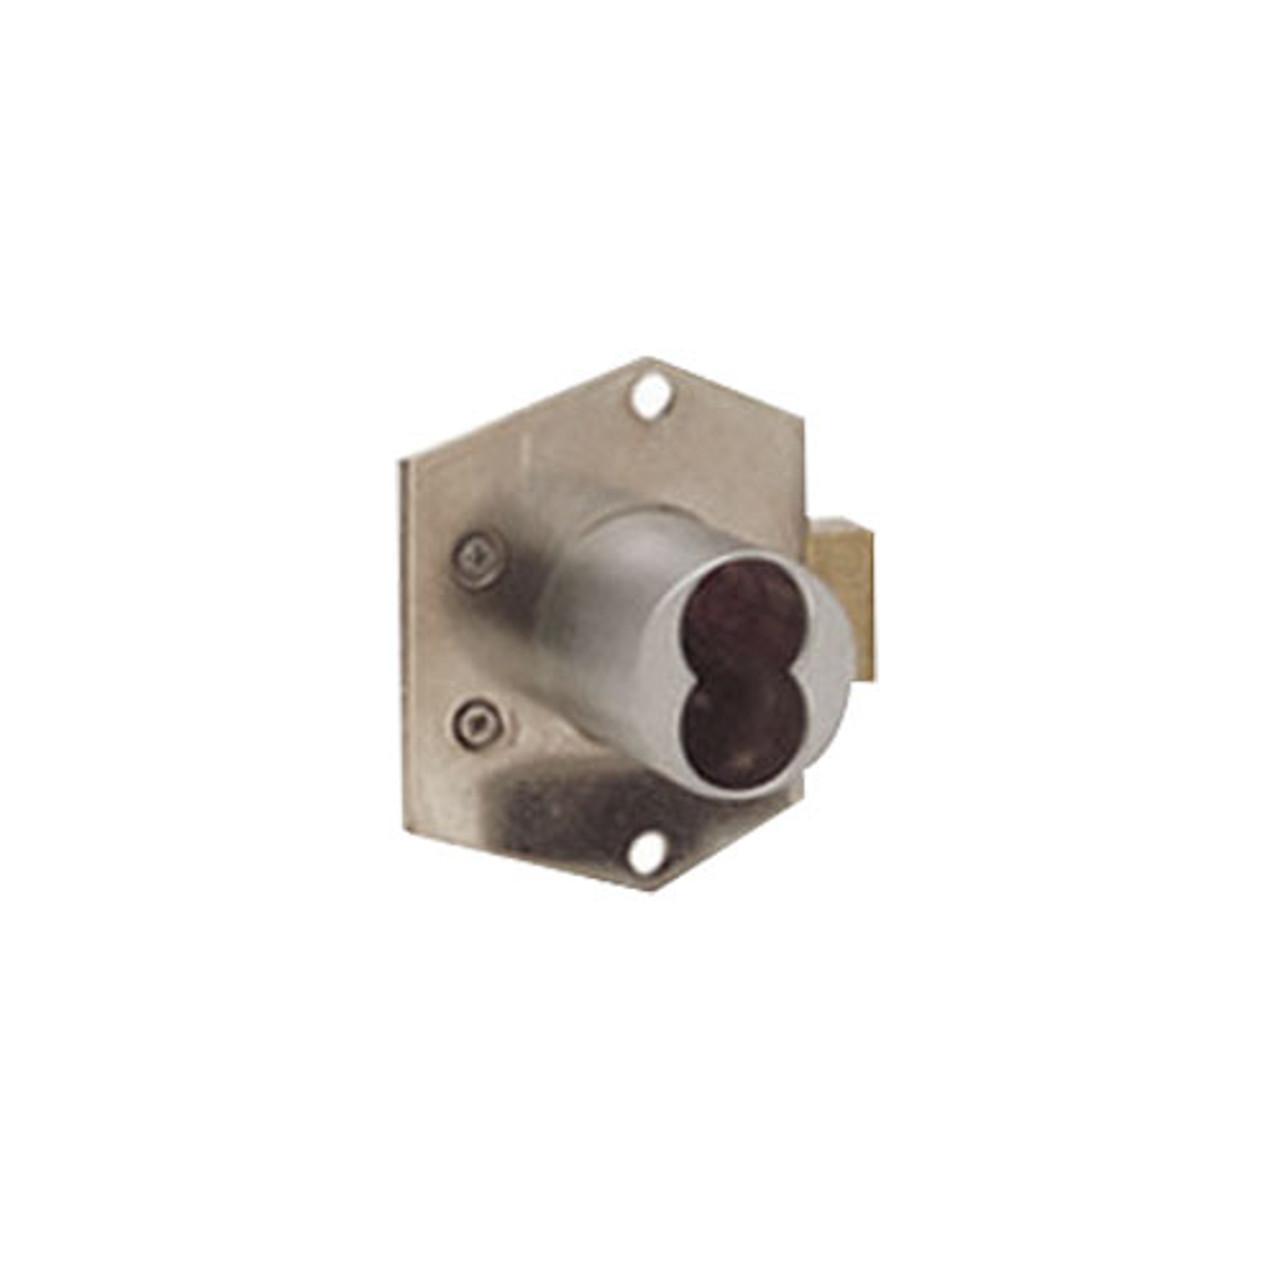 Olympus 725RD-DR-RH-26D Rim Mount Deadbolt Cabinet Locks in Satin Chrome Finish